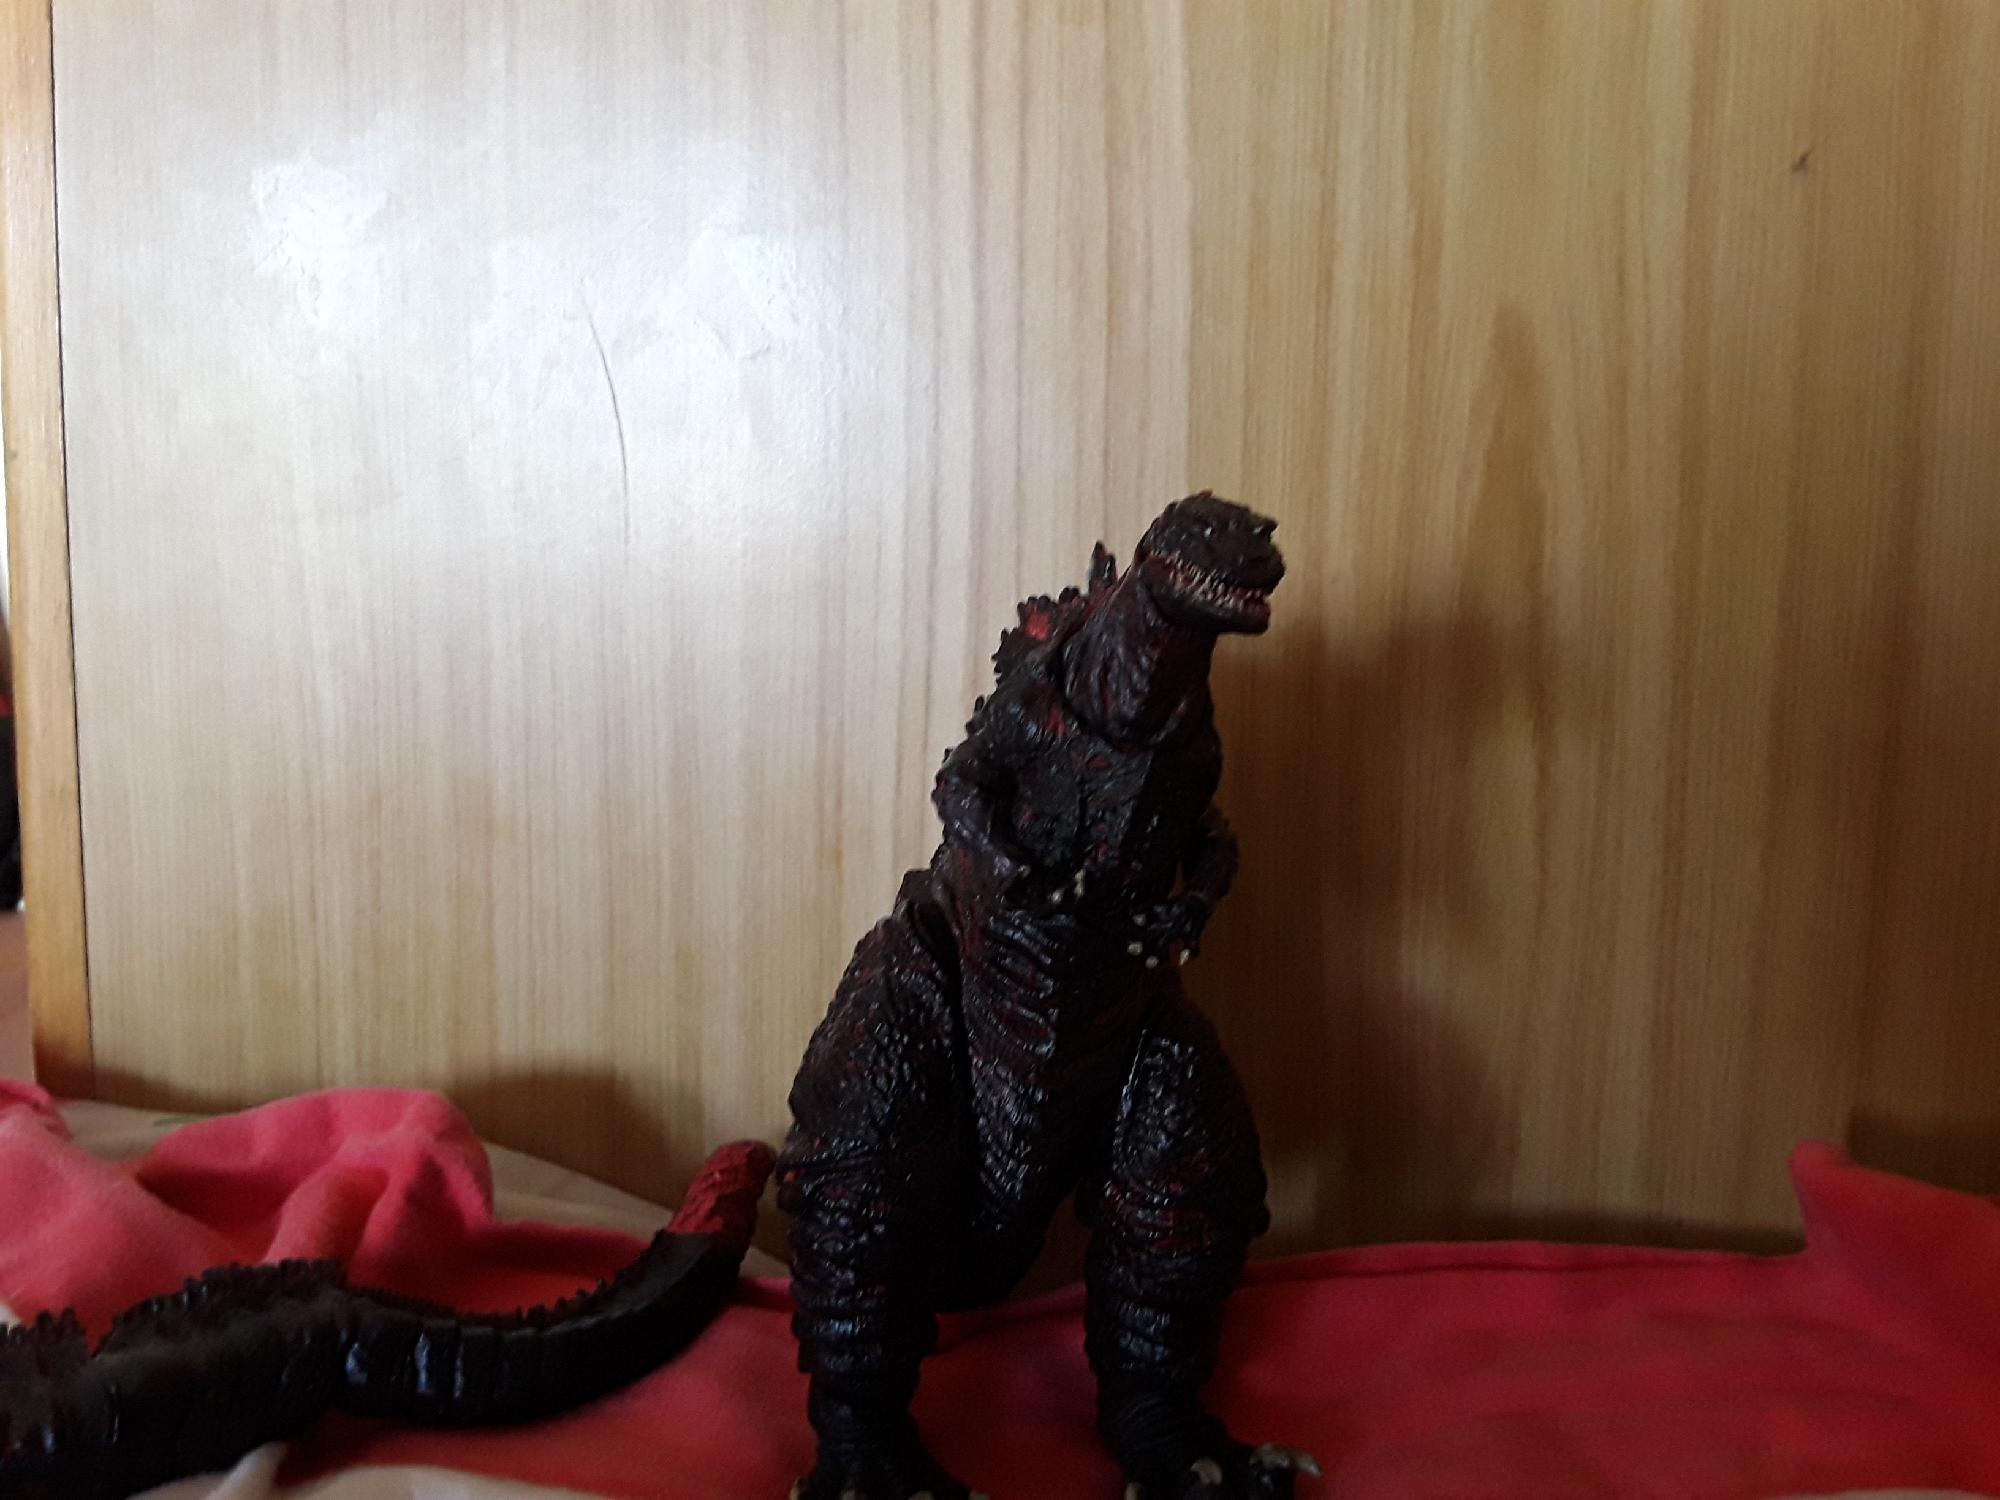 Tengo un juguete de neca de Shin Godzilla